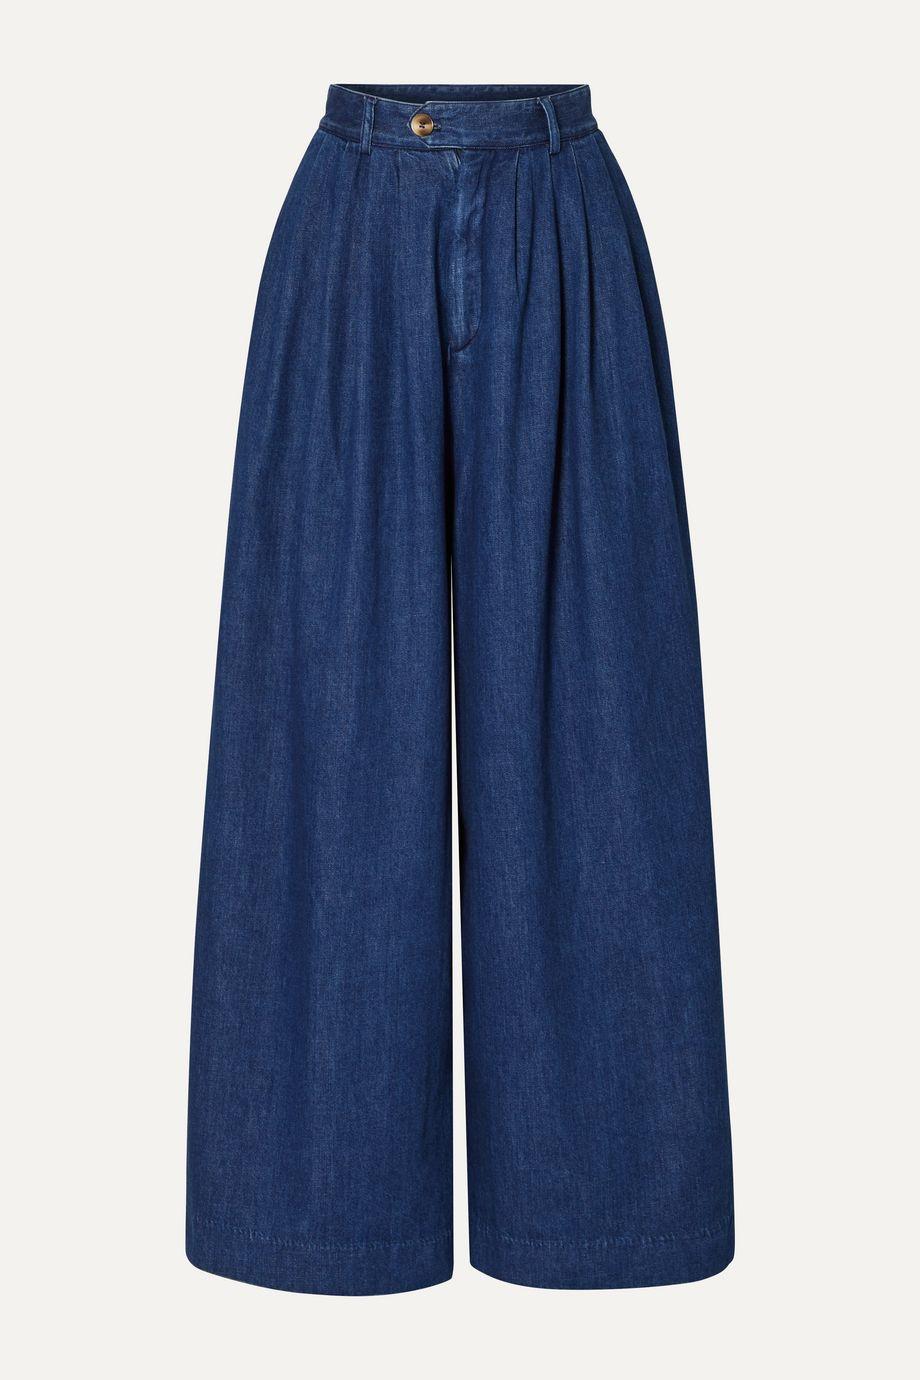 King & Tuckfield High-rise wide-leg jeans